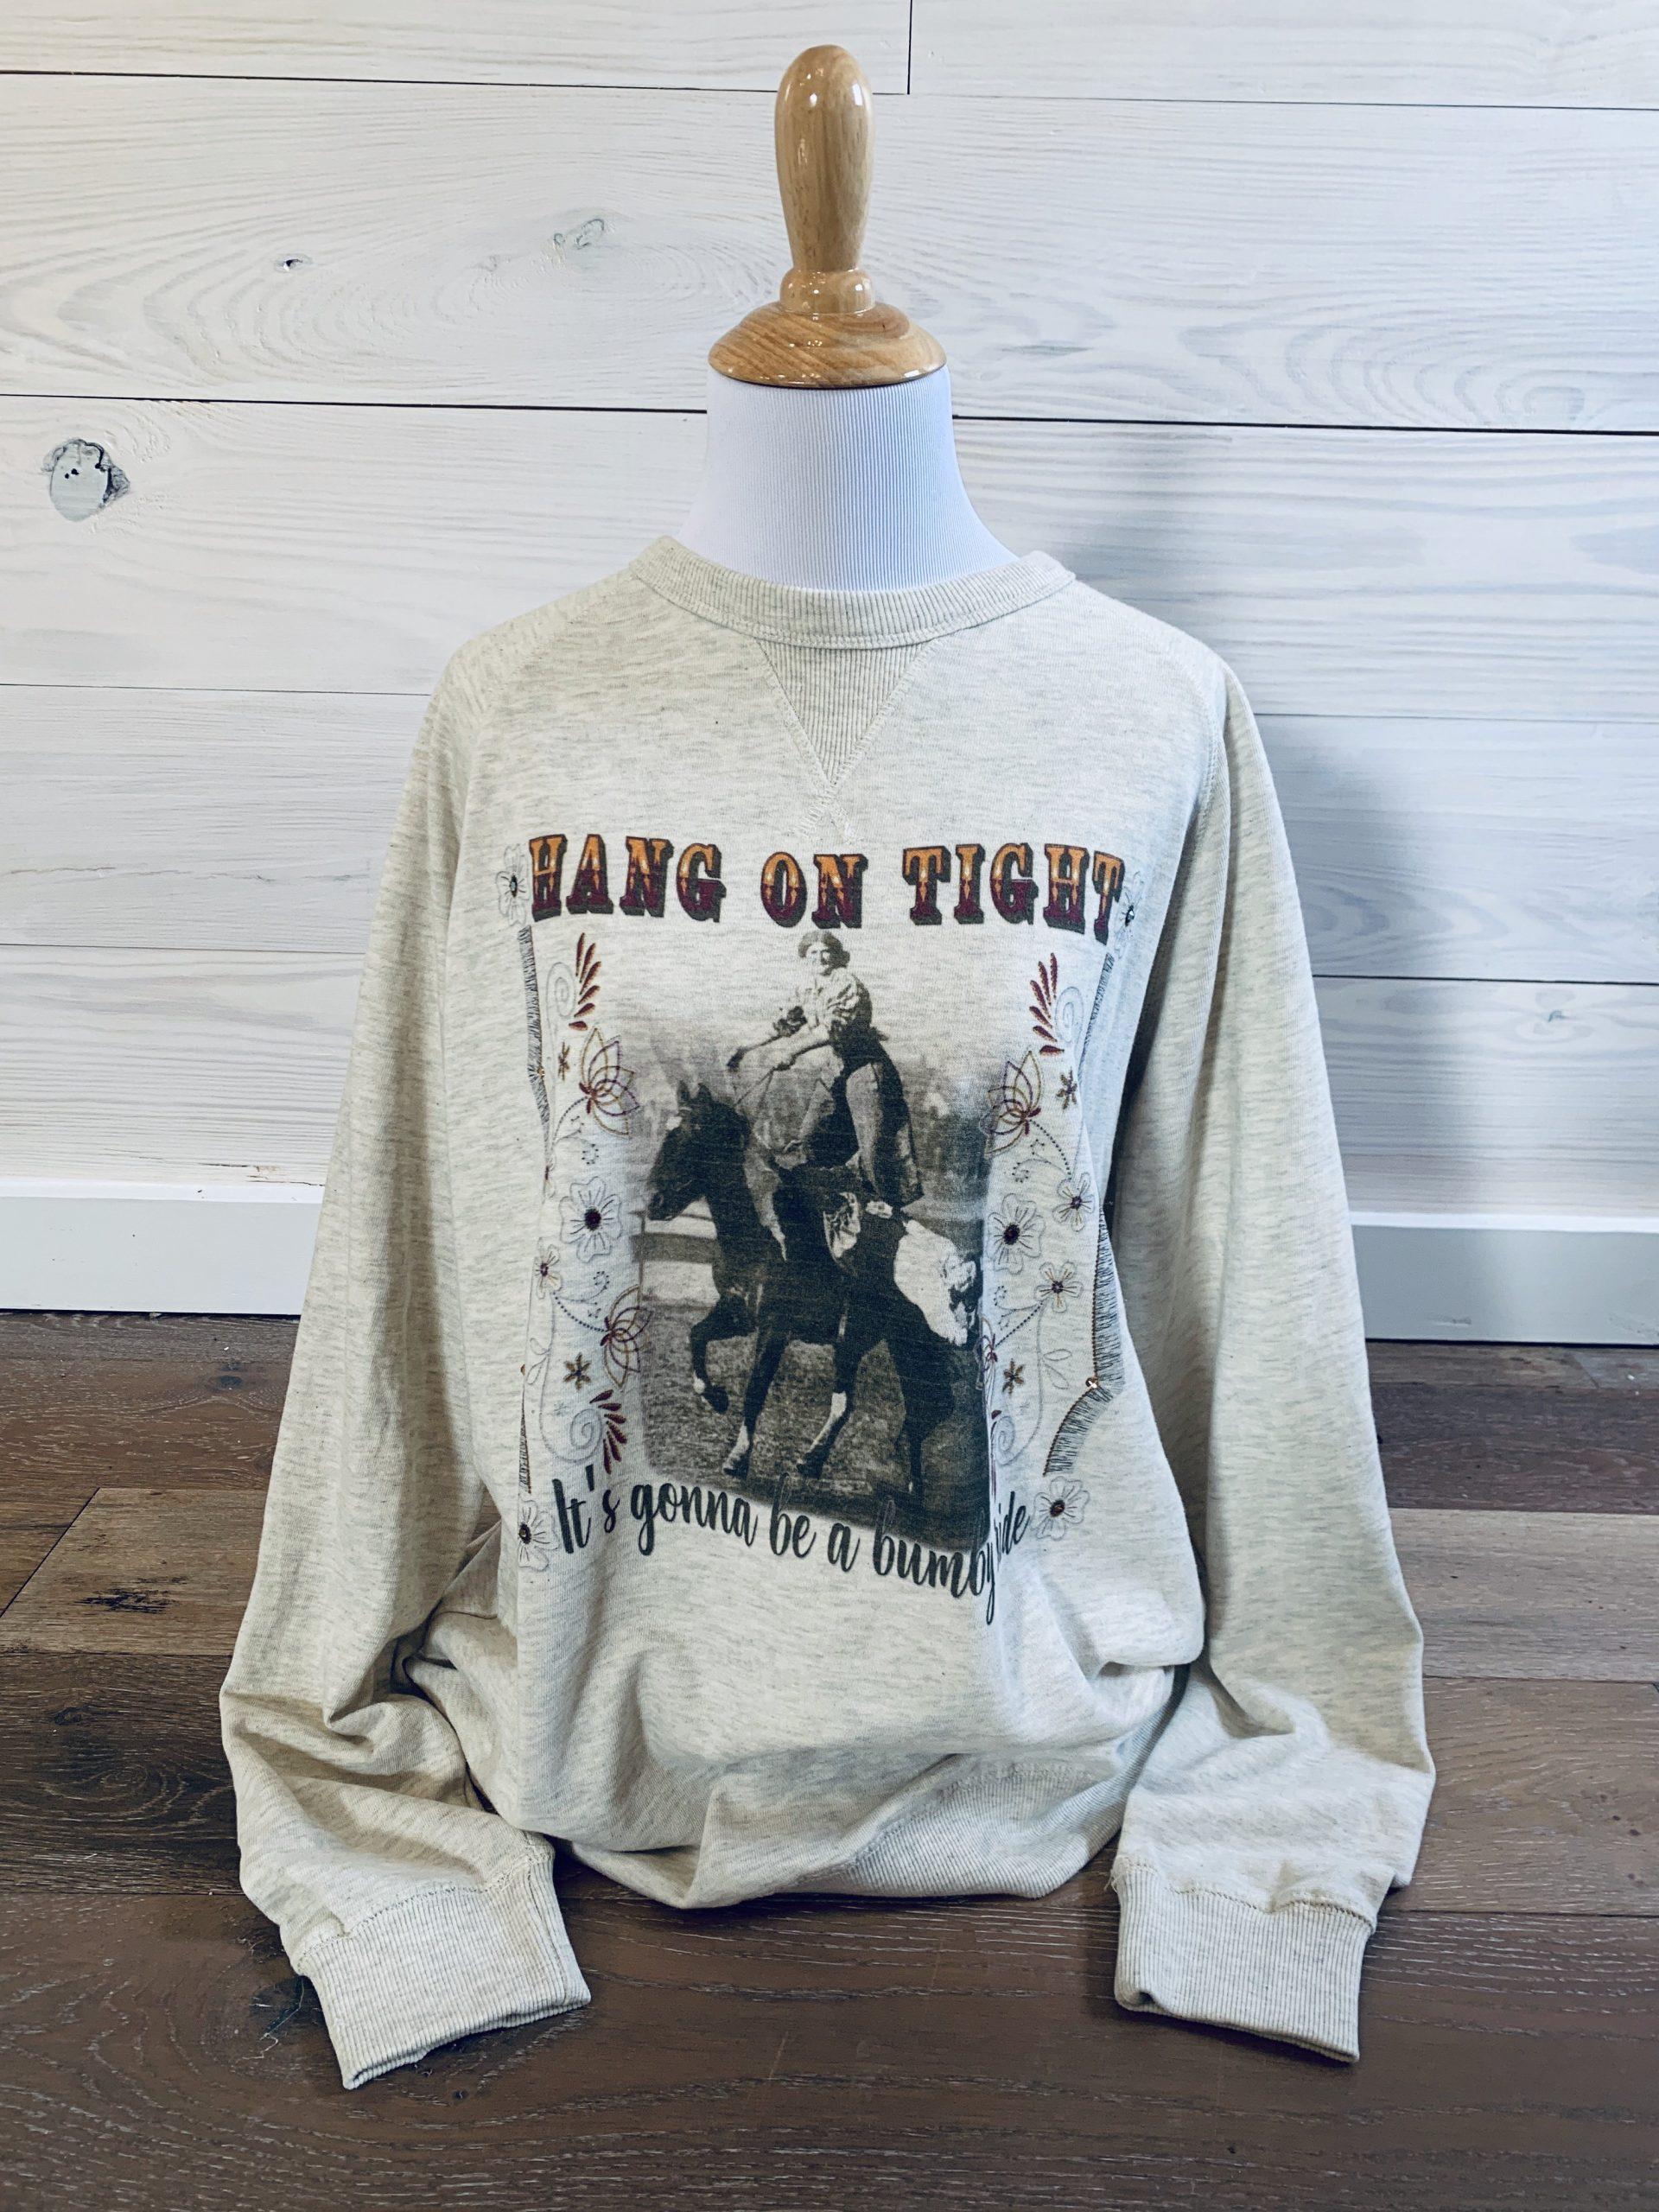 Hang On Tight on Light Grey Sweatshirt